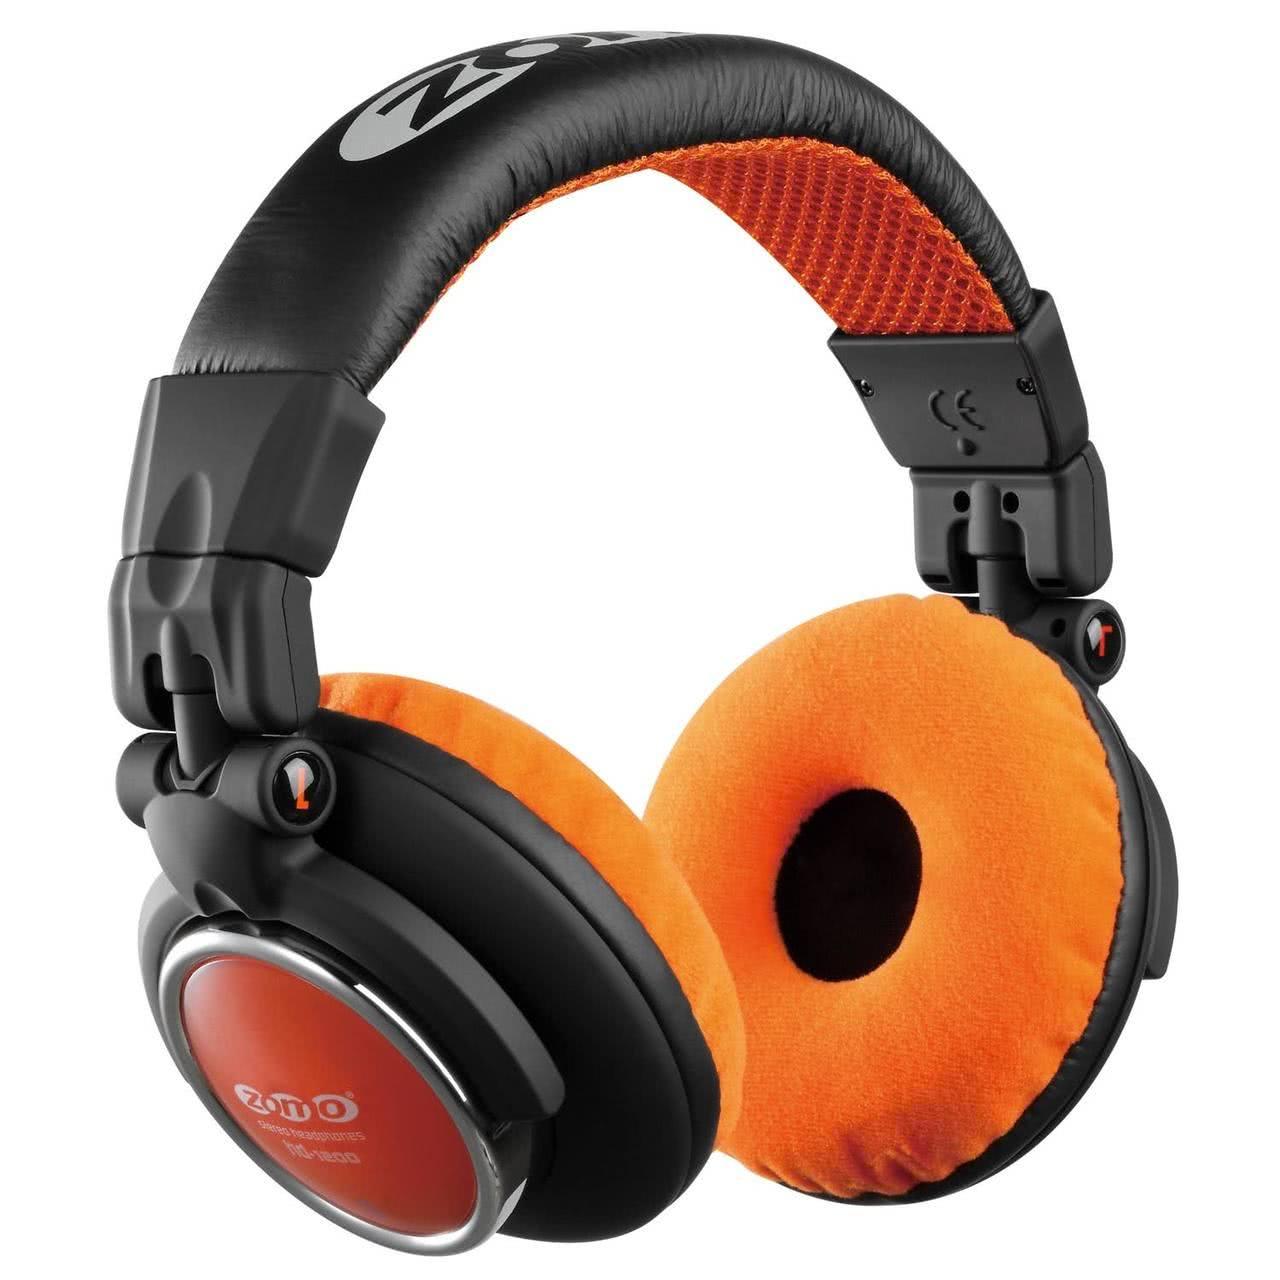 Zomo HD-1200 schwarz/orange